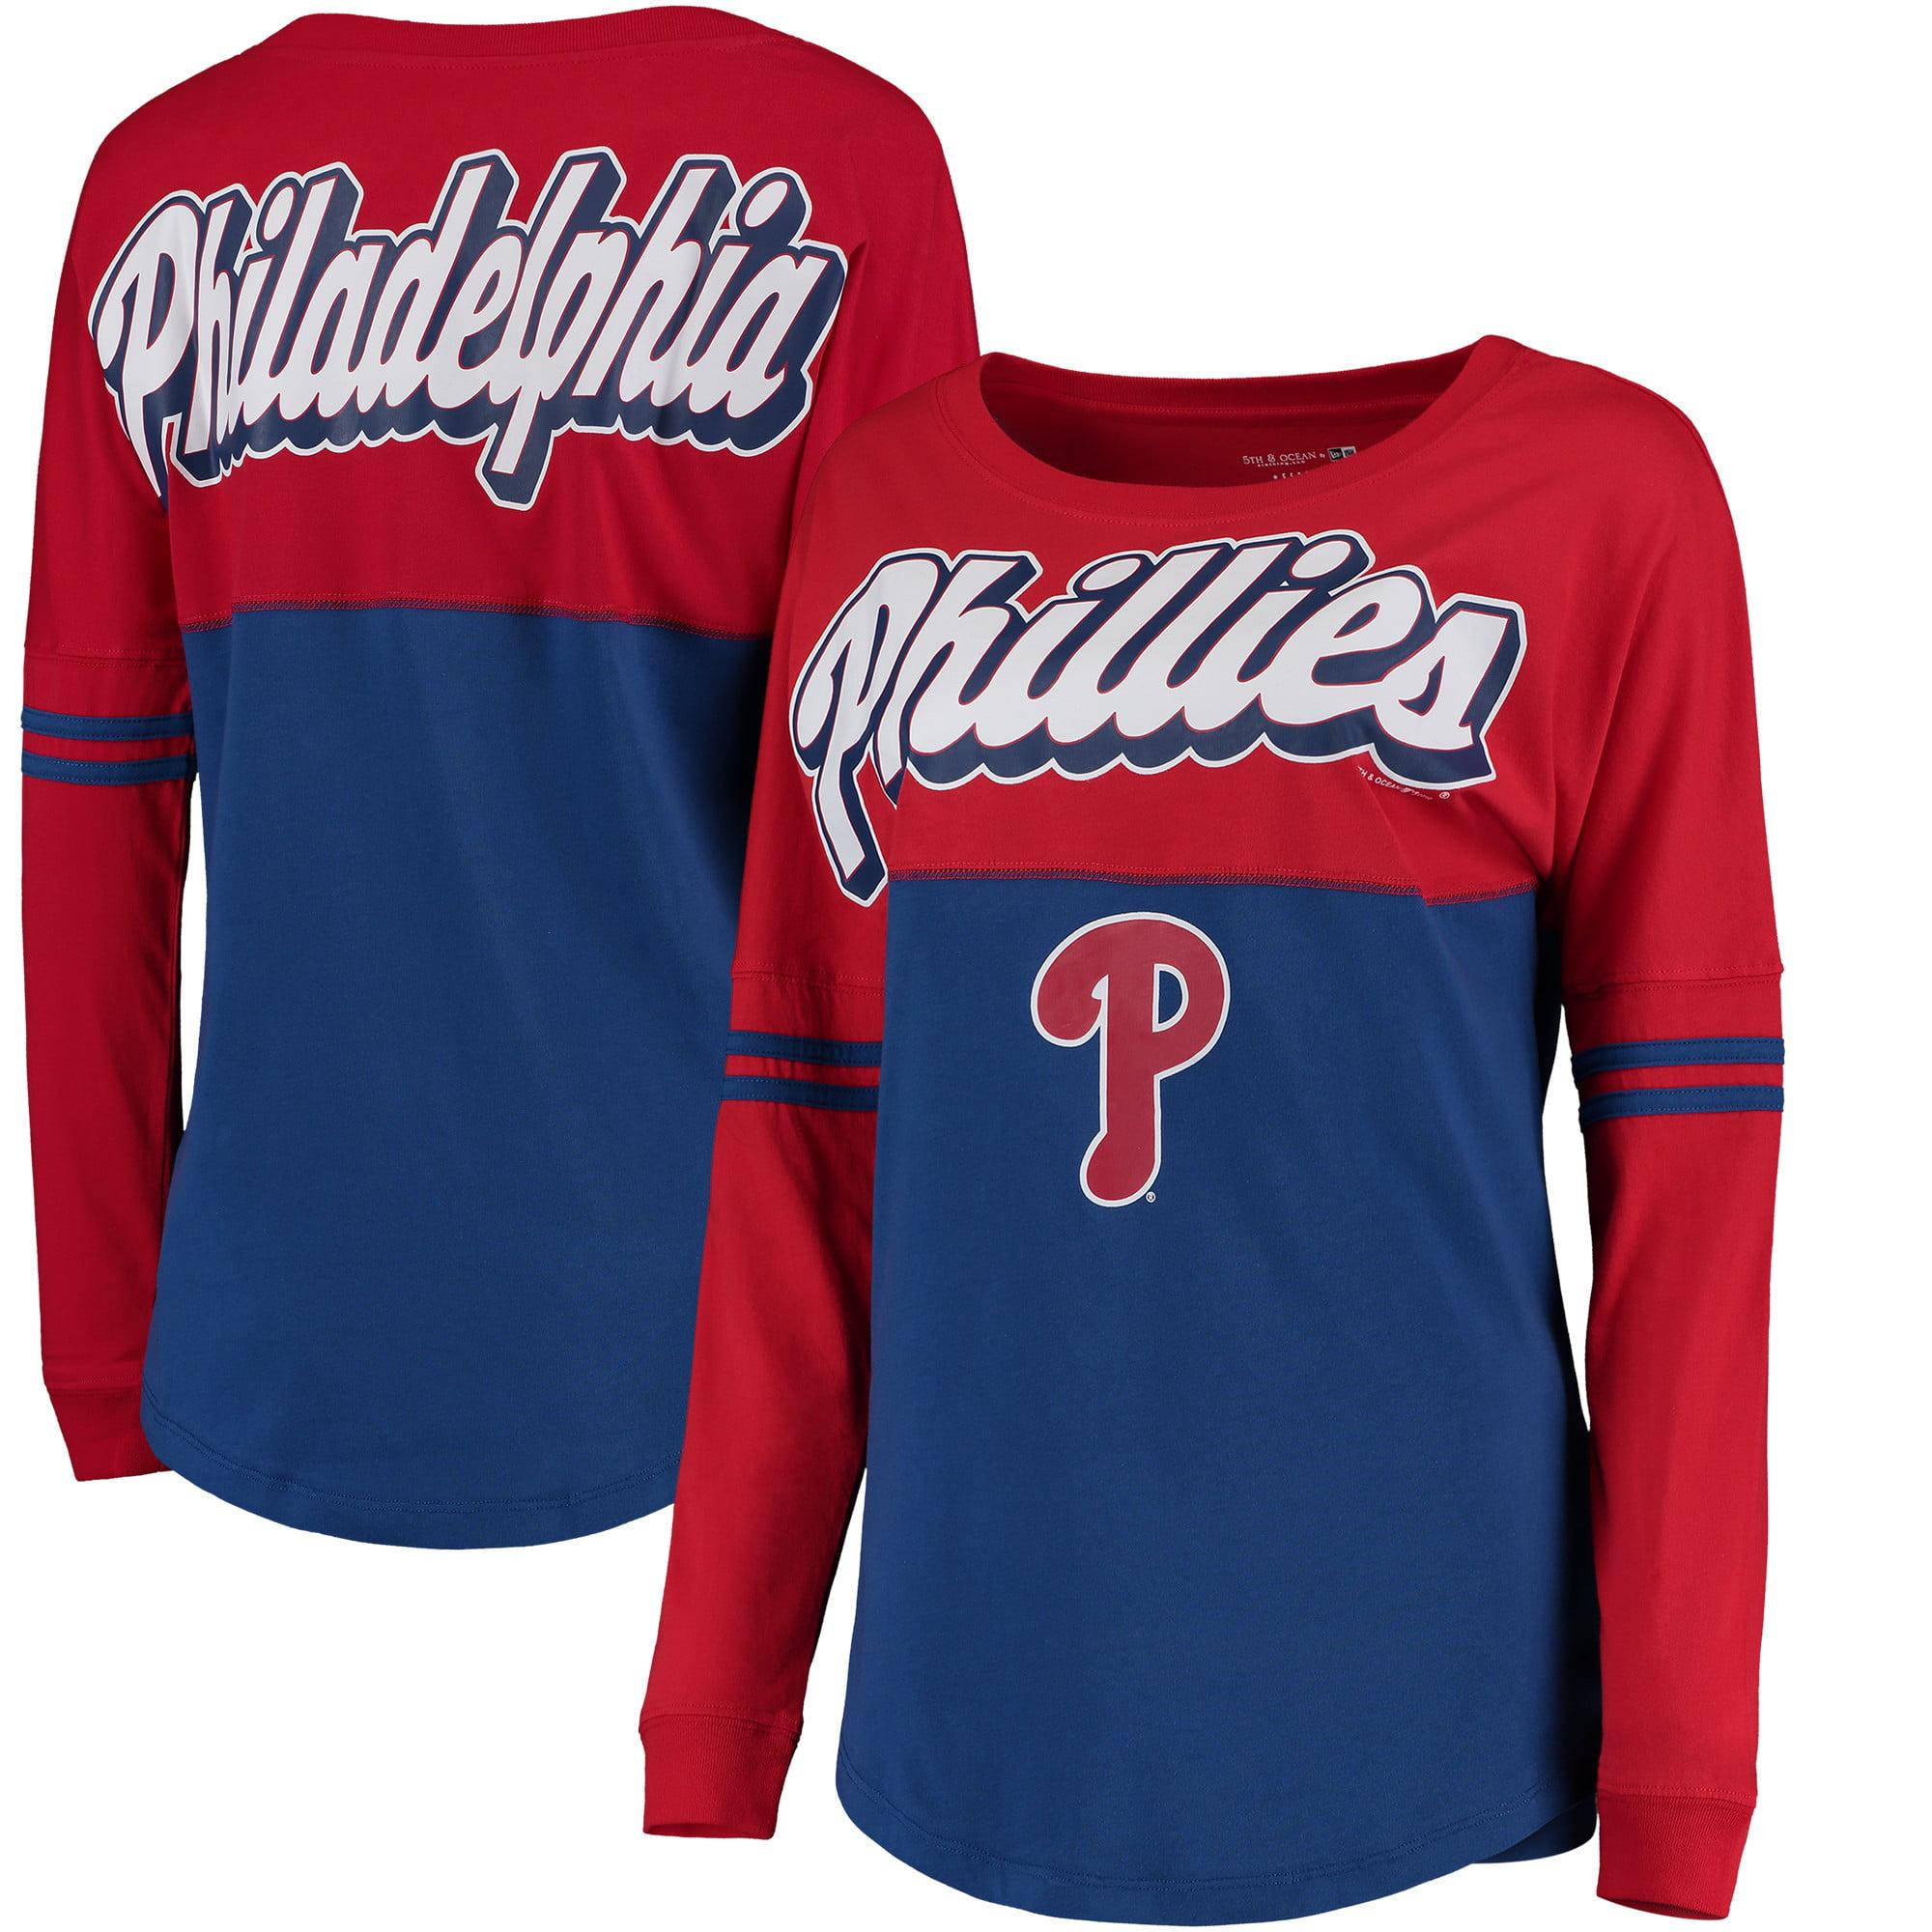 Philadelphia Phillies 5th & Ocean by New Era Women's MLB Baby Jersey Varsity Crew Boyfriend Long Sleeve T-Shirt - Royal